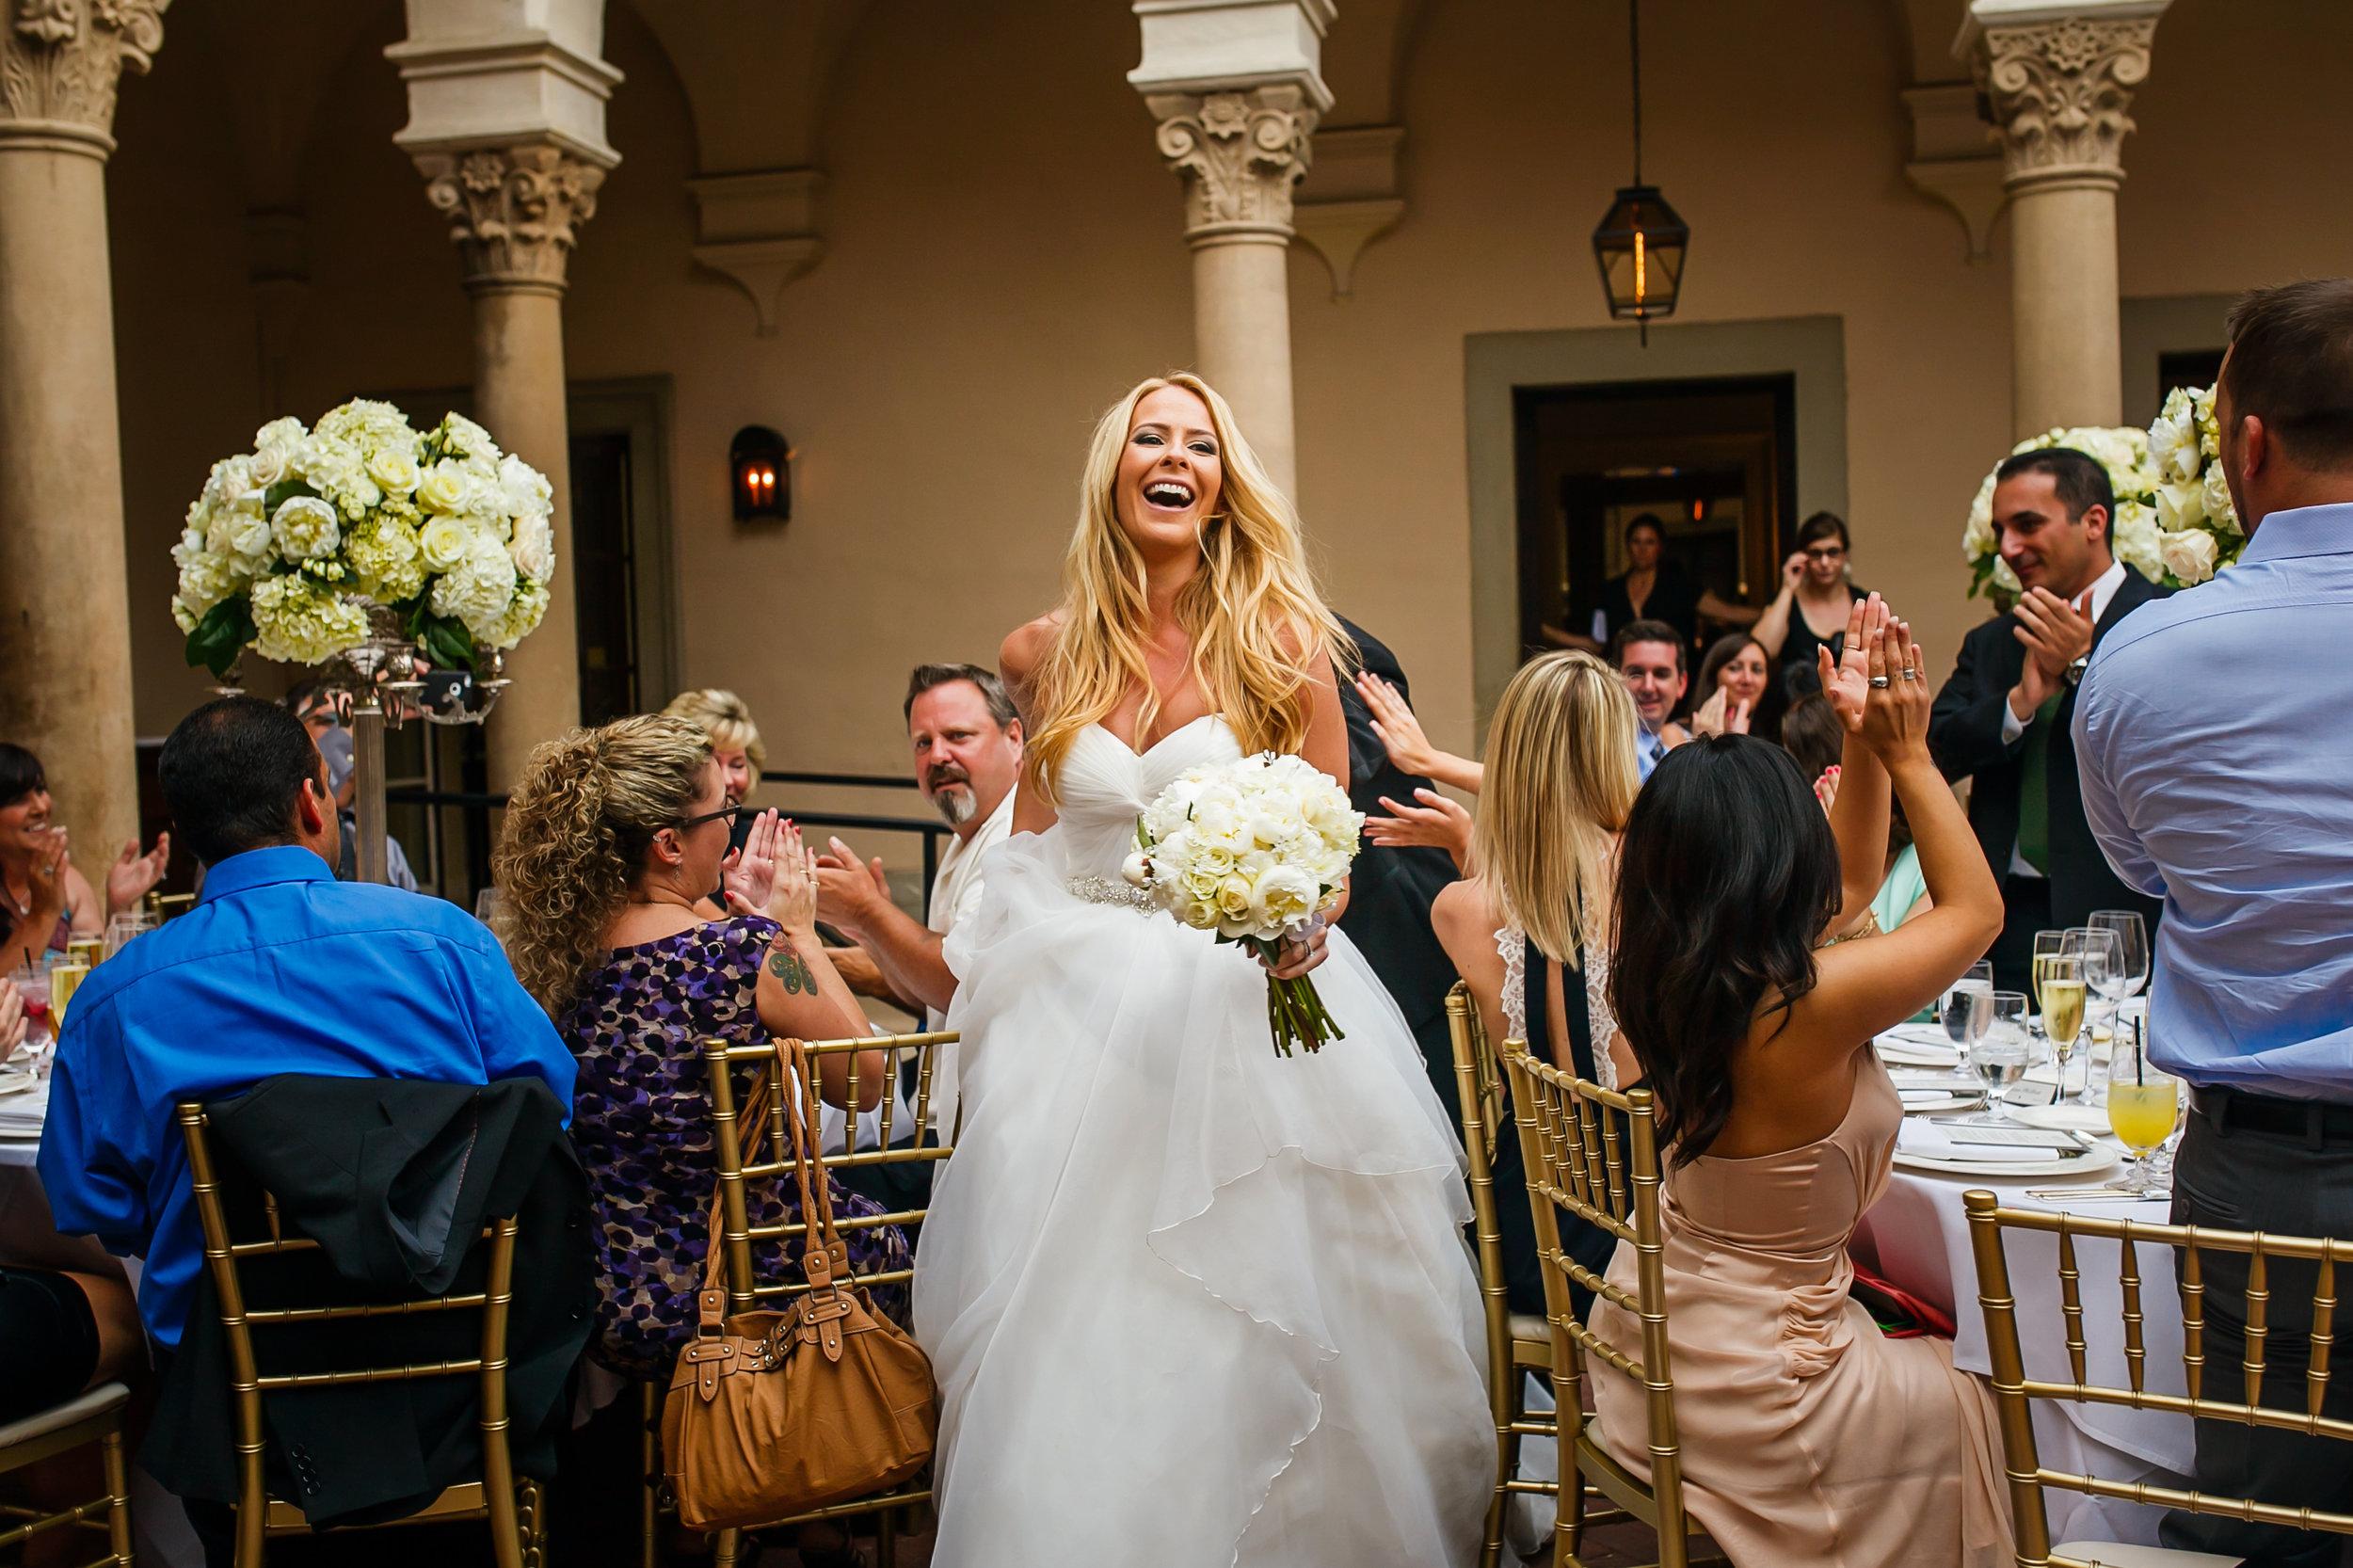 WEDDING AT THE ATHENAEUM AT CALTECH IN PASADENA, CA